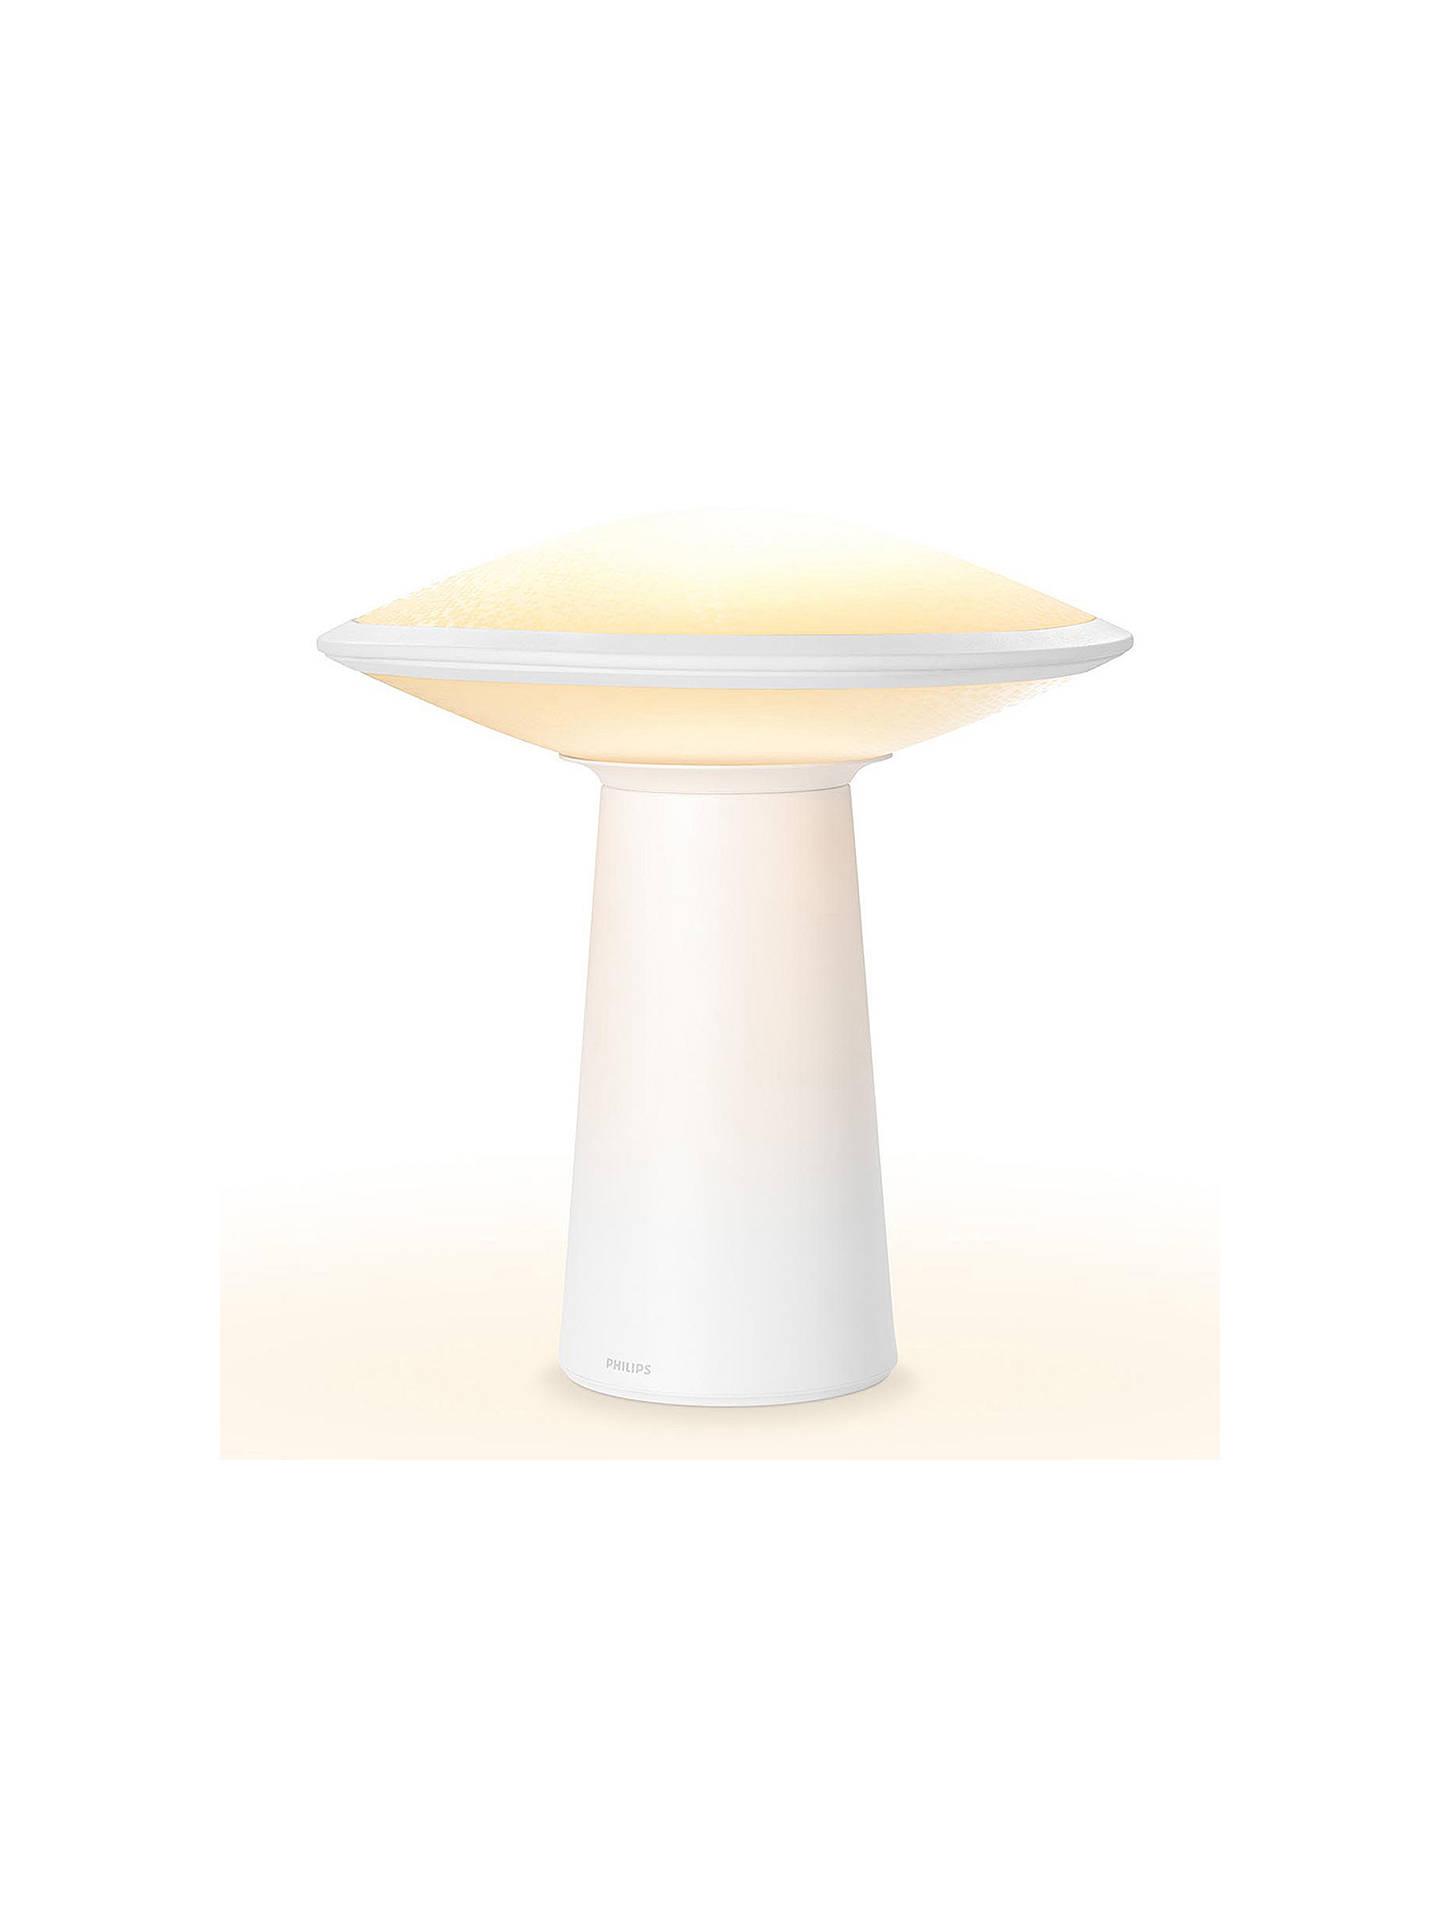 Philips Hue Phoenix Led Table Lamp At John Lewis Amp Partners